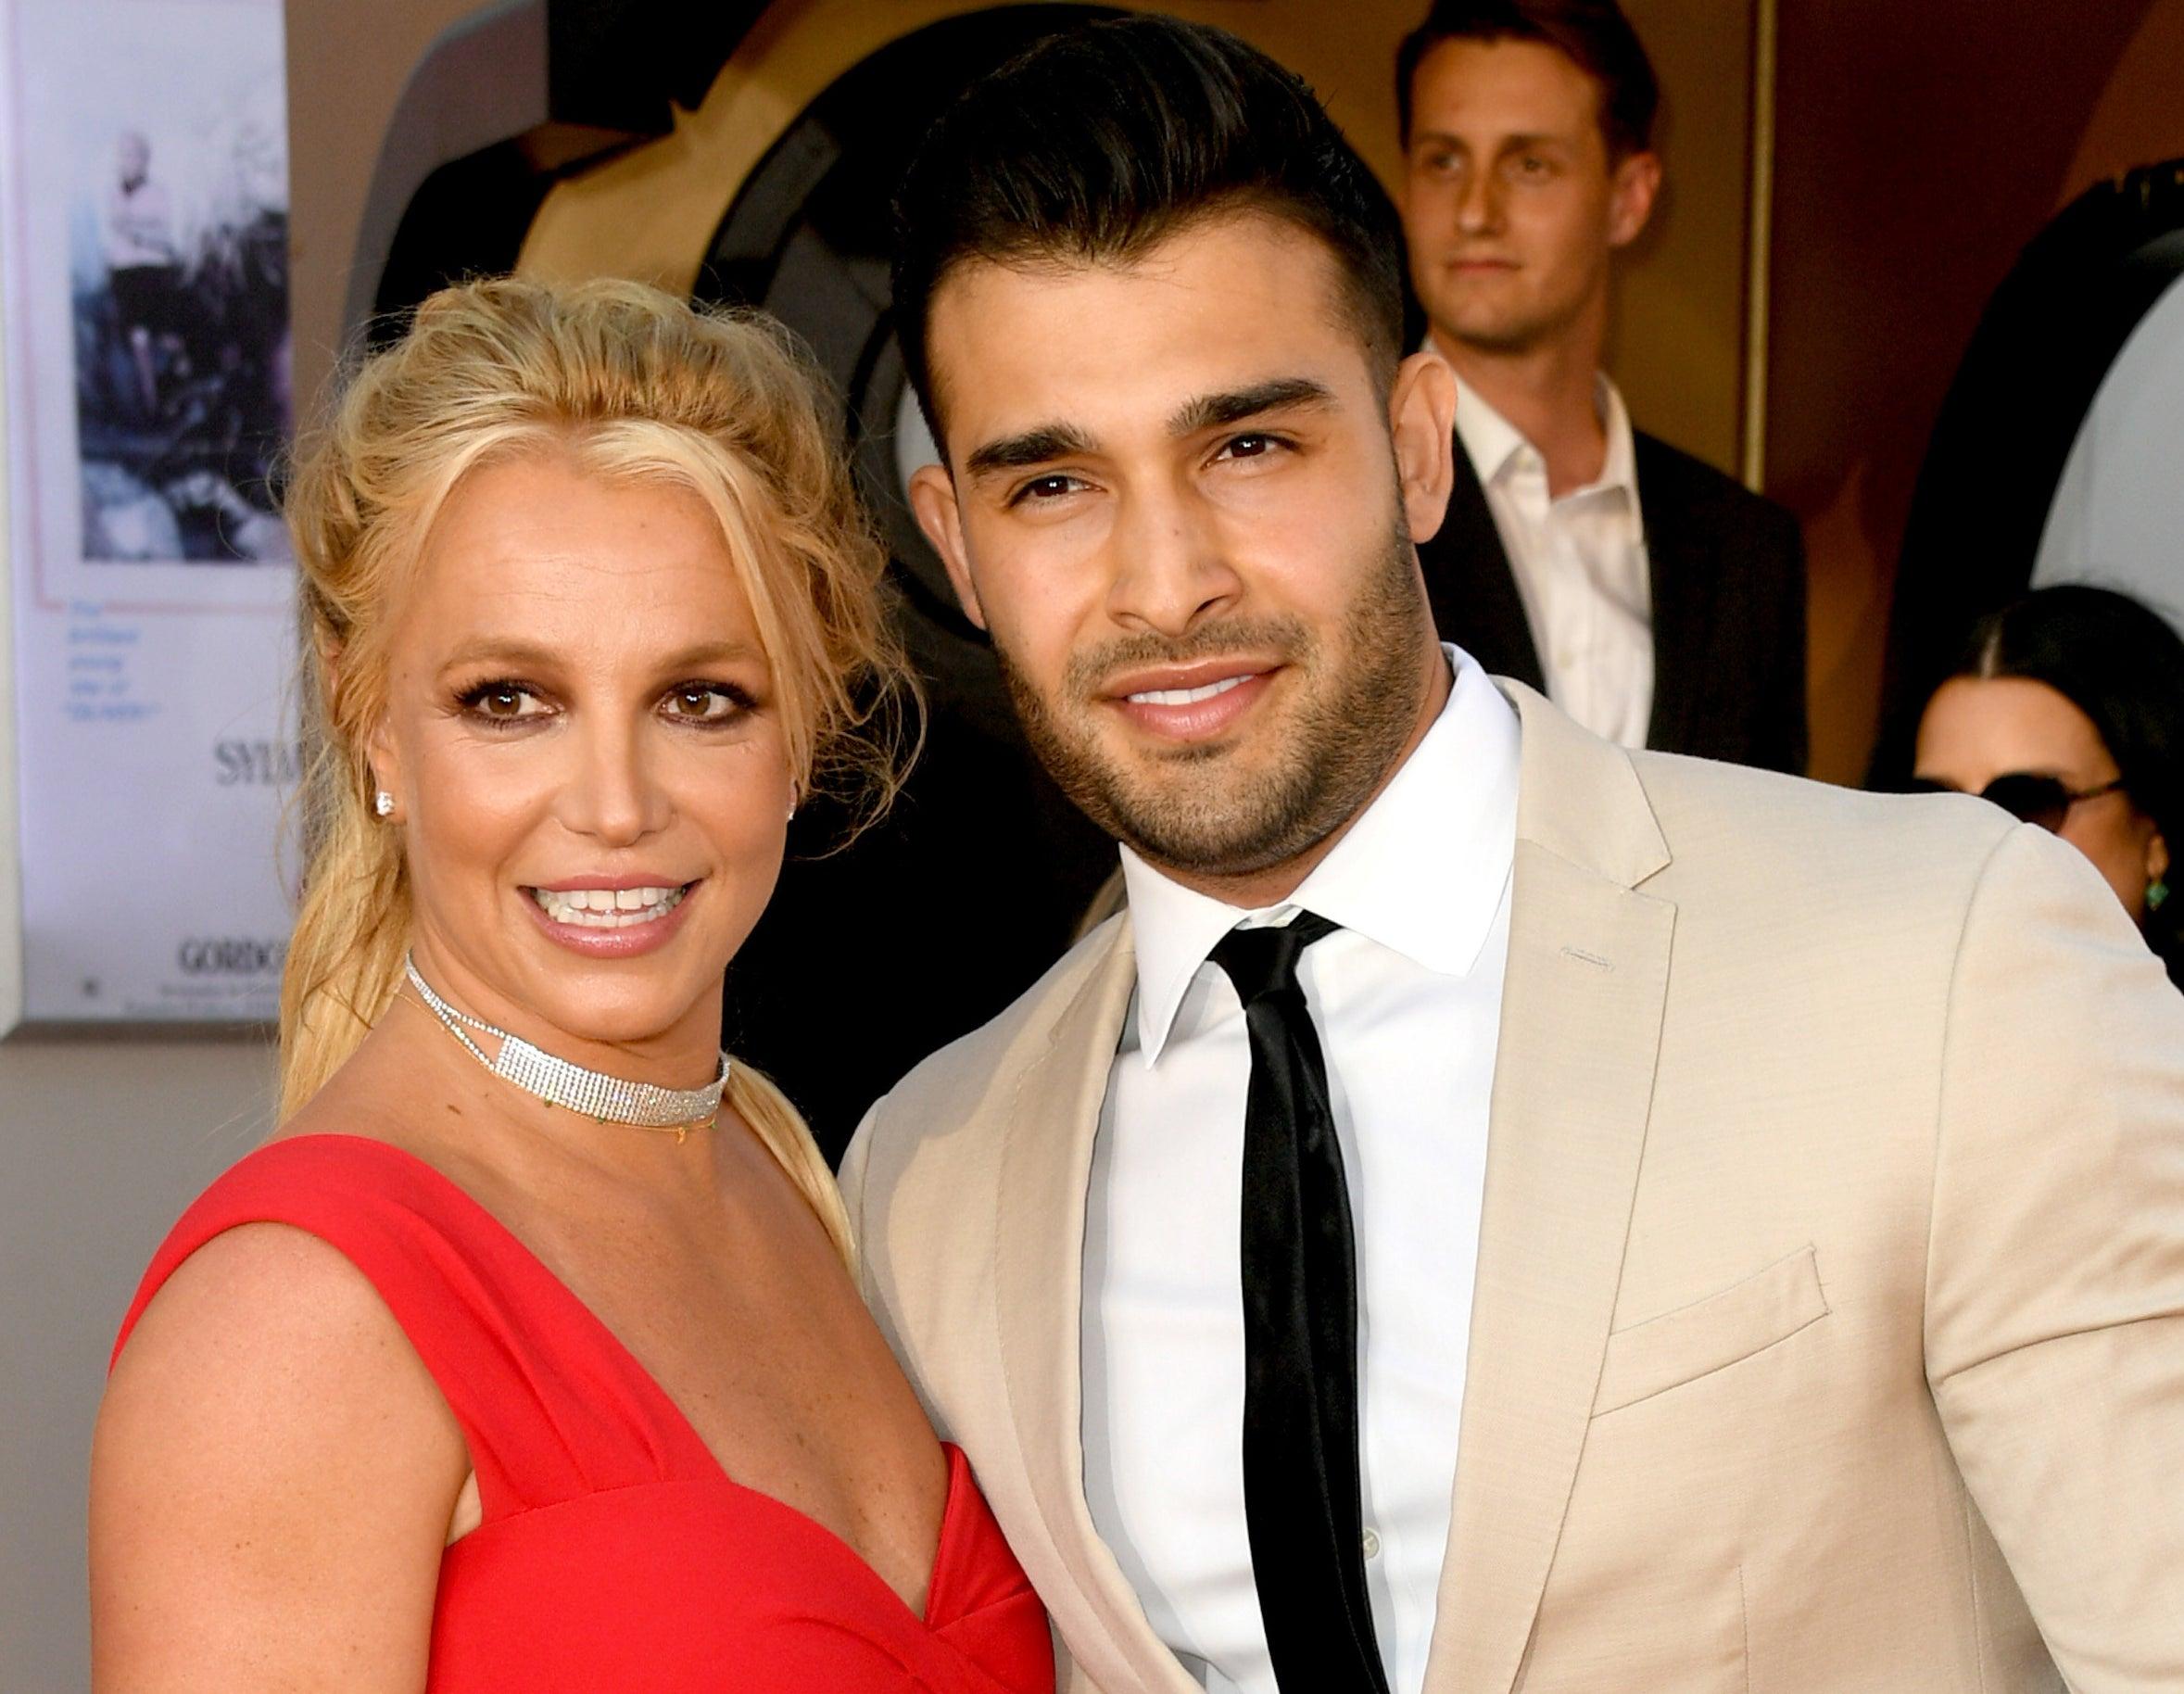 Britney poses with her boyfriend Sam